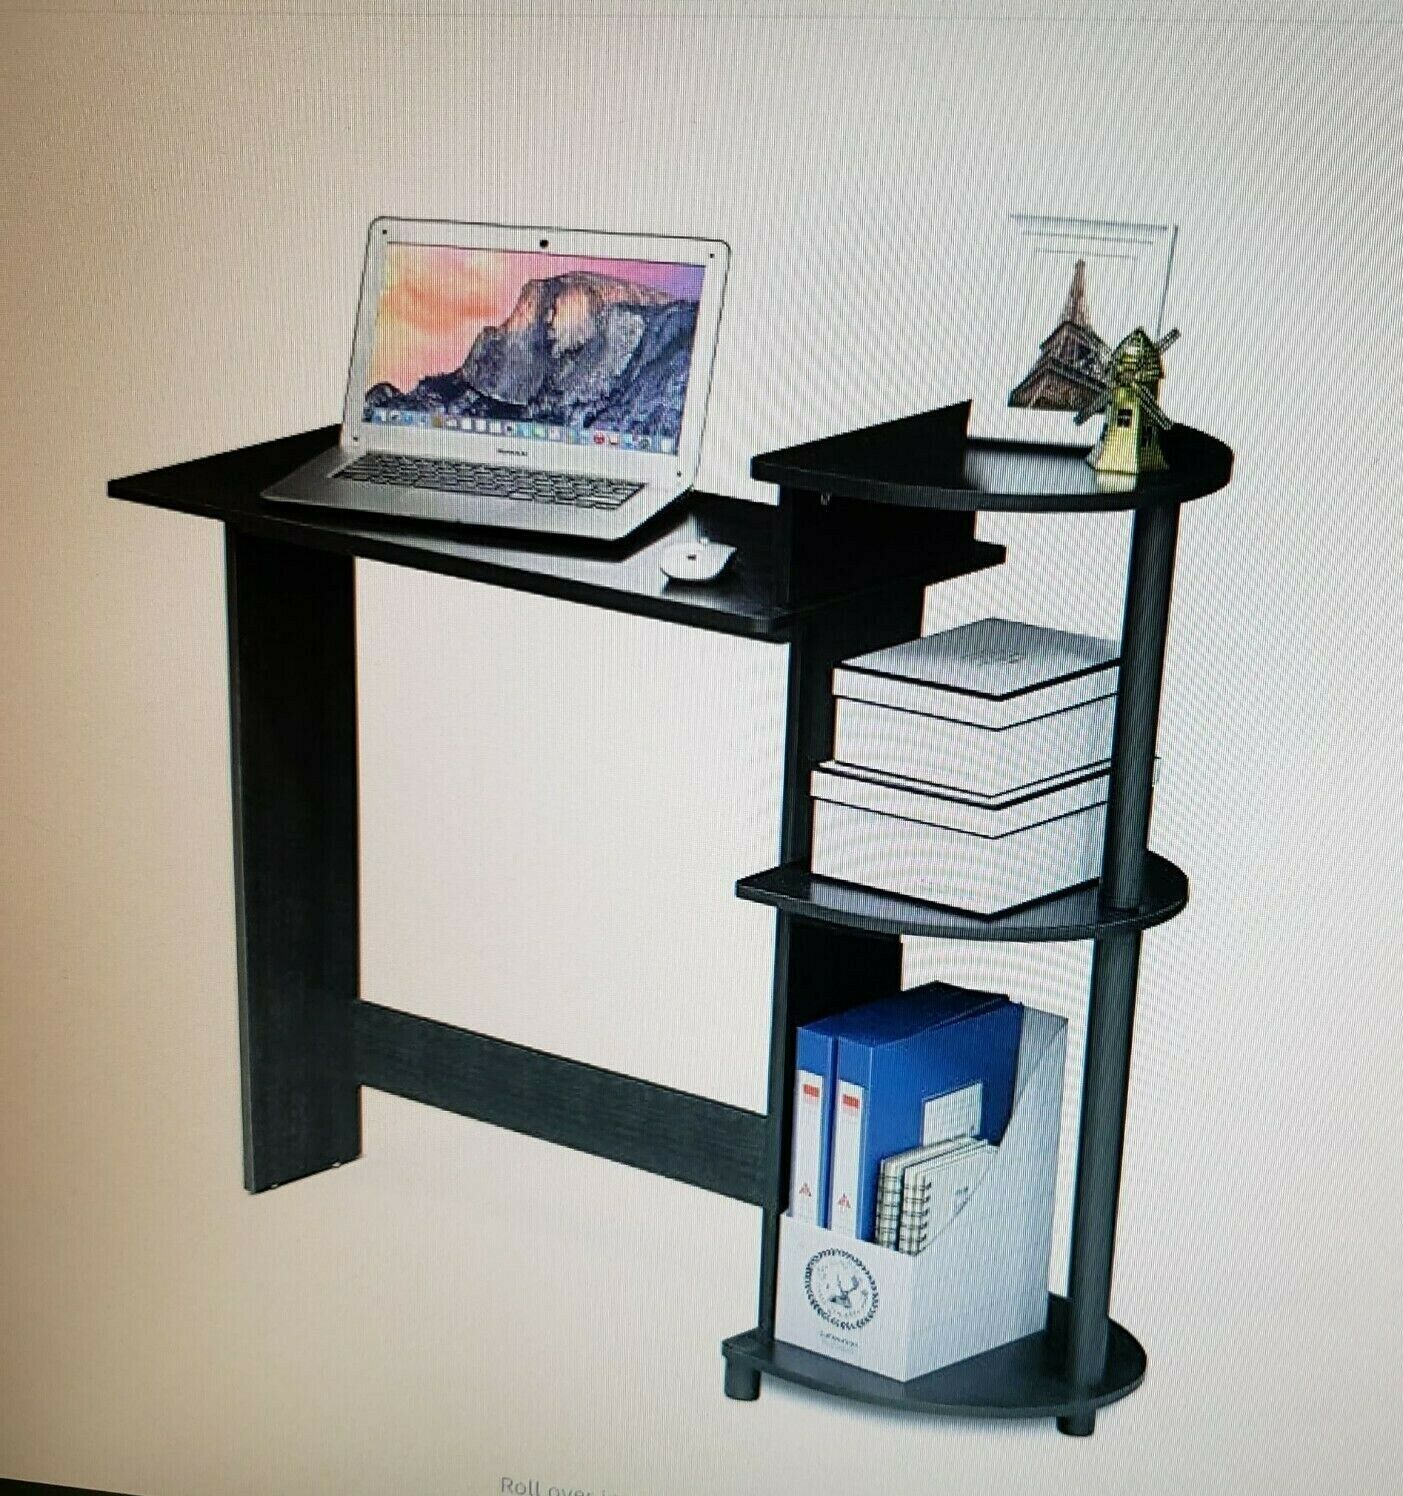 compact computer desk round side shelves black